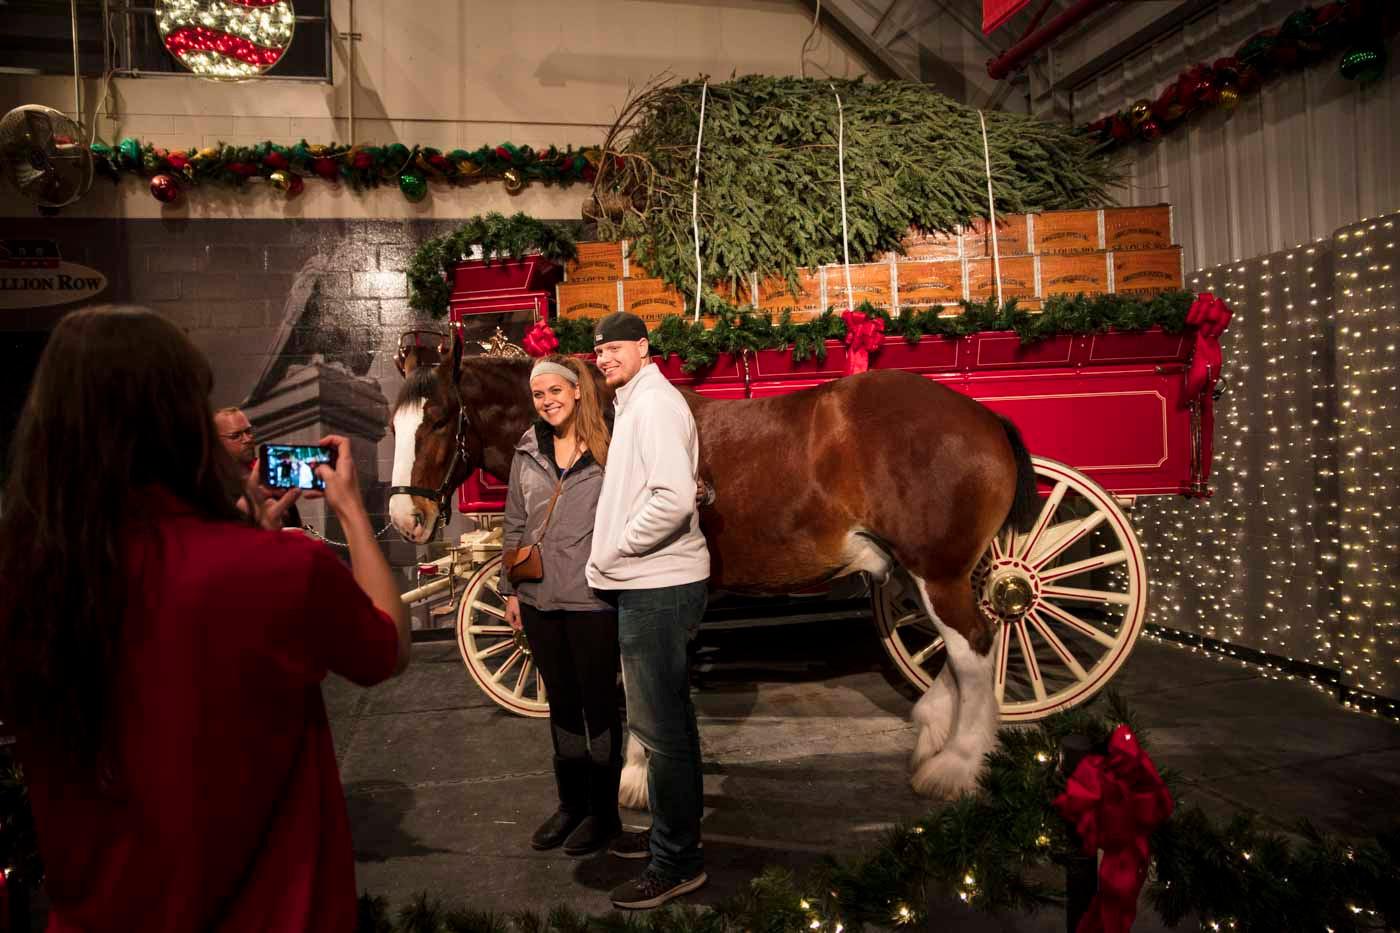 Warm Springs Ranch Christmas Lights 2020 Visit Missouri | Articles | Missouri Makes the Holiday Season